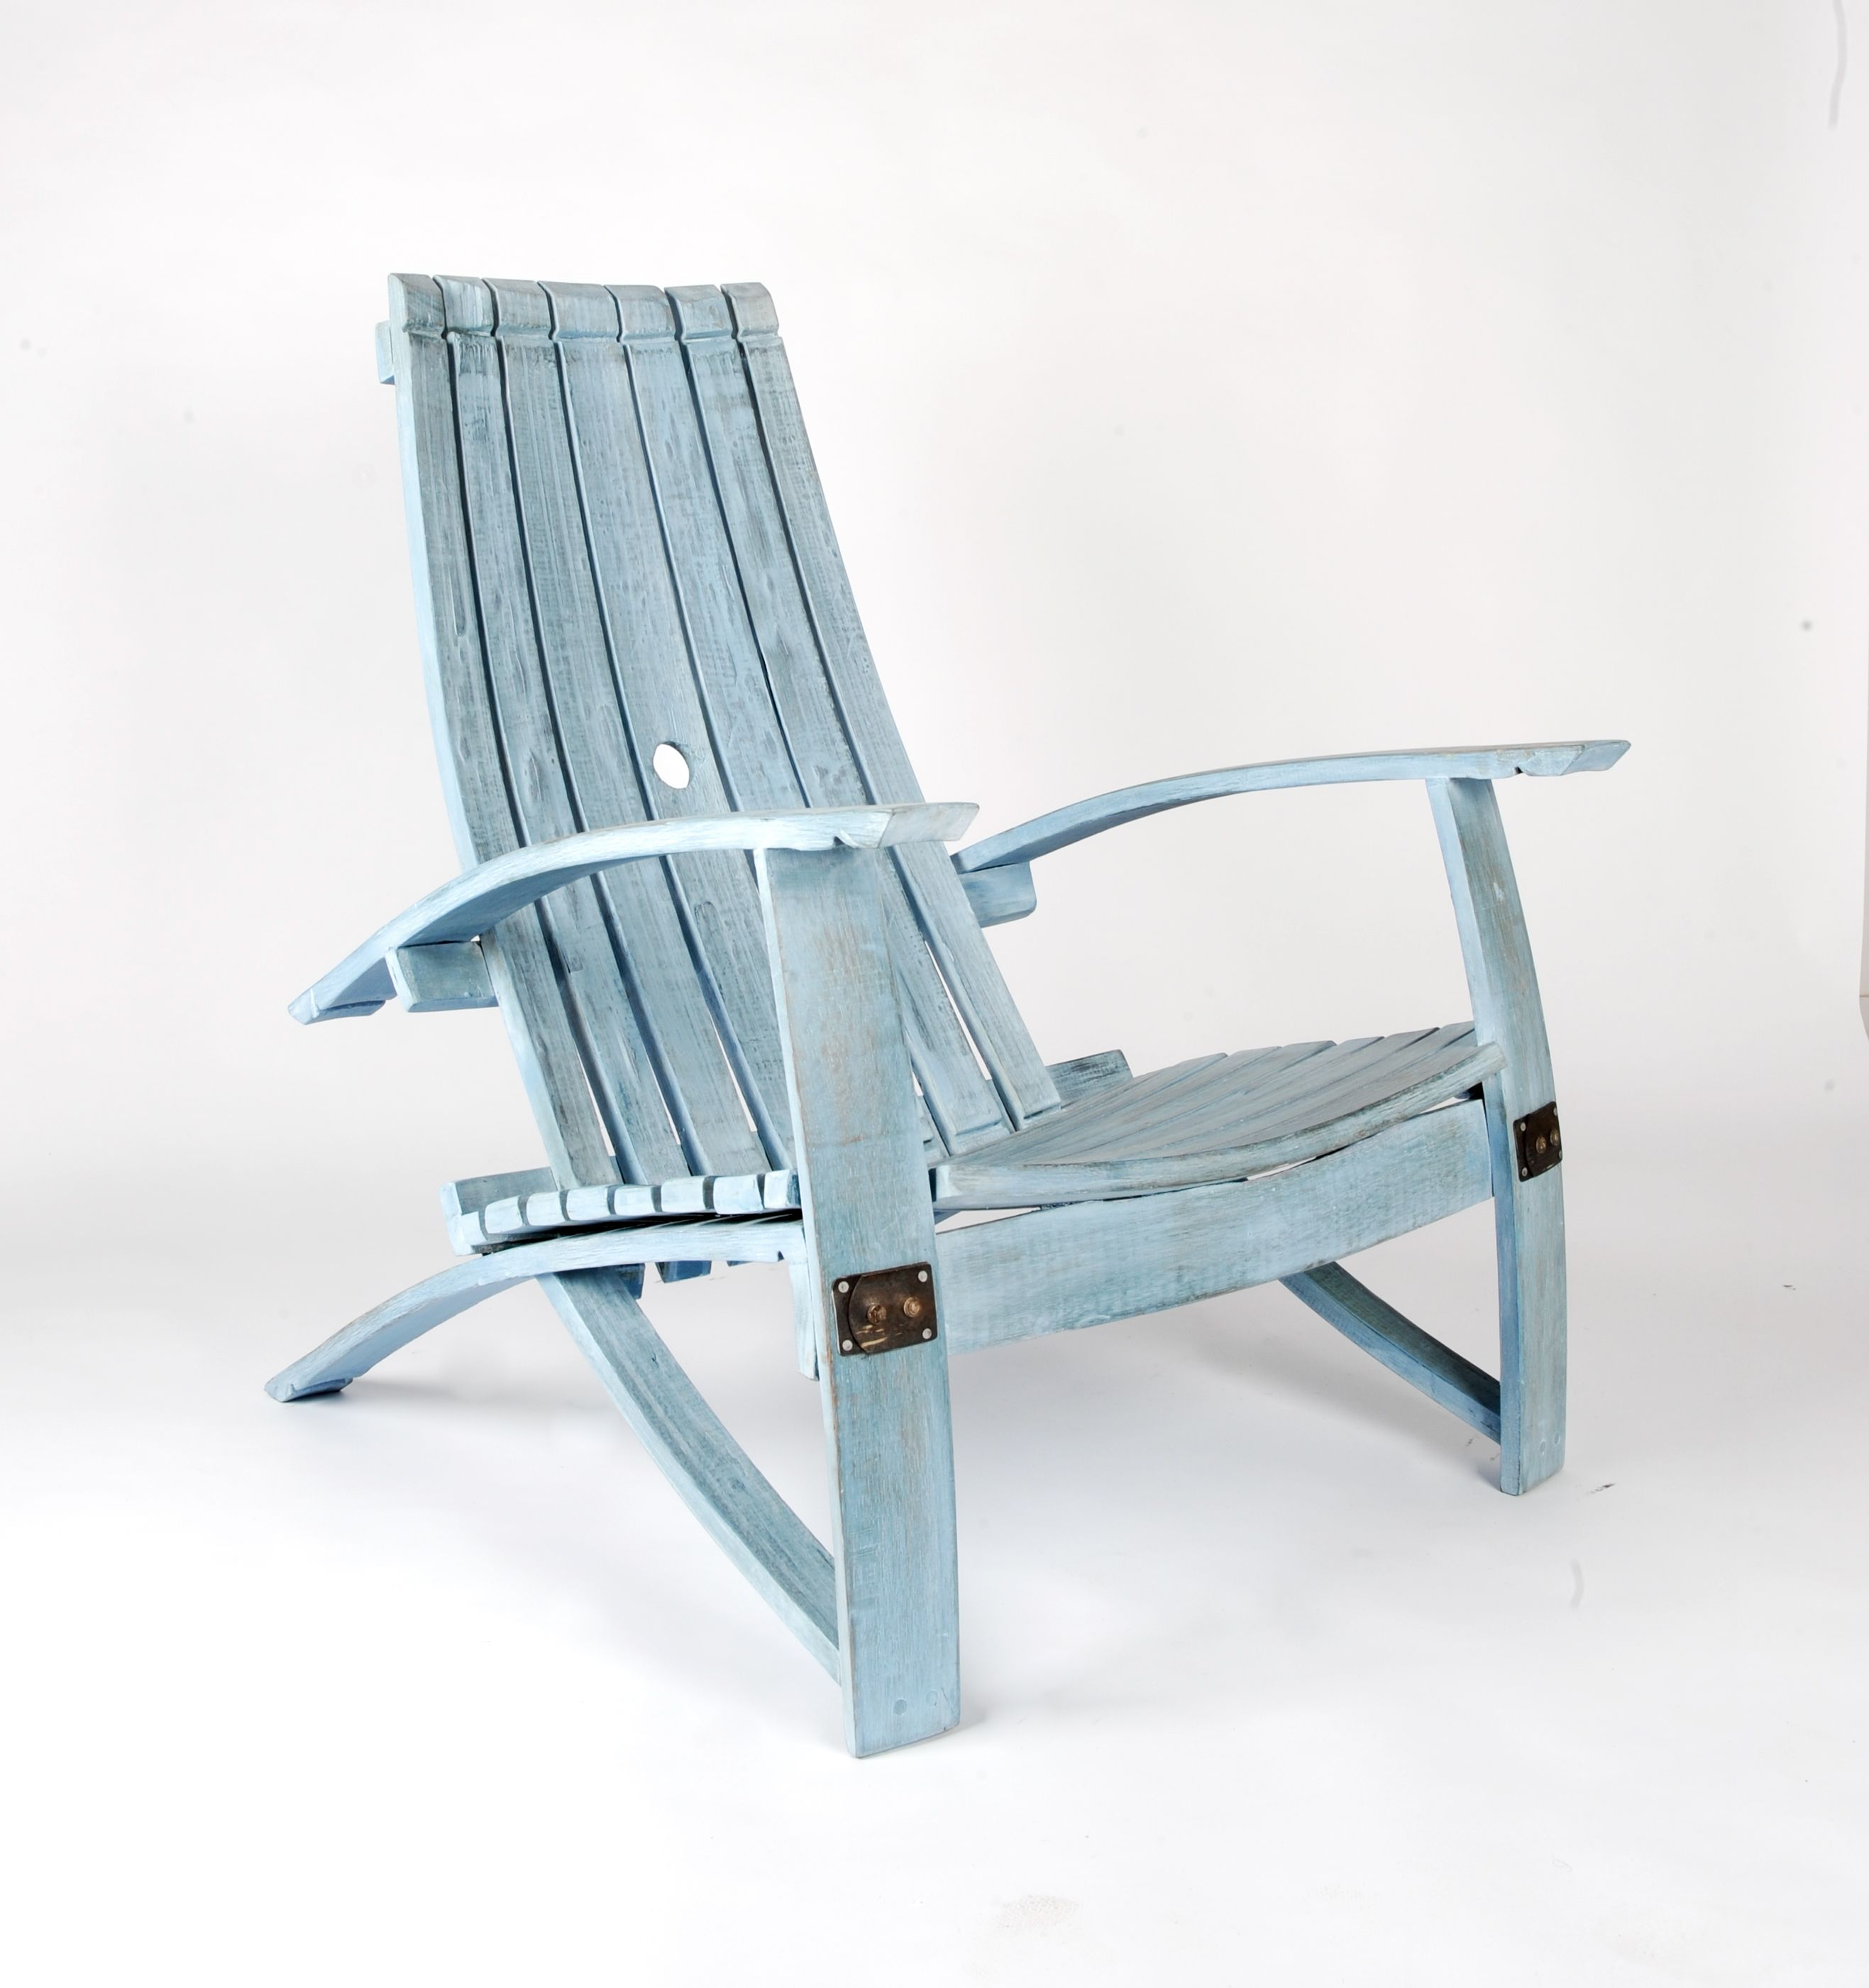 Buy A Handmade Wine Barrel Adirondack Chair Distressed